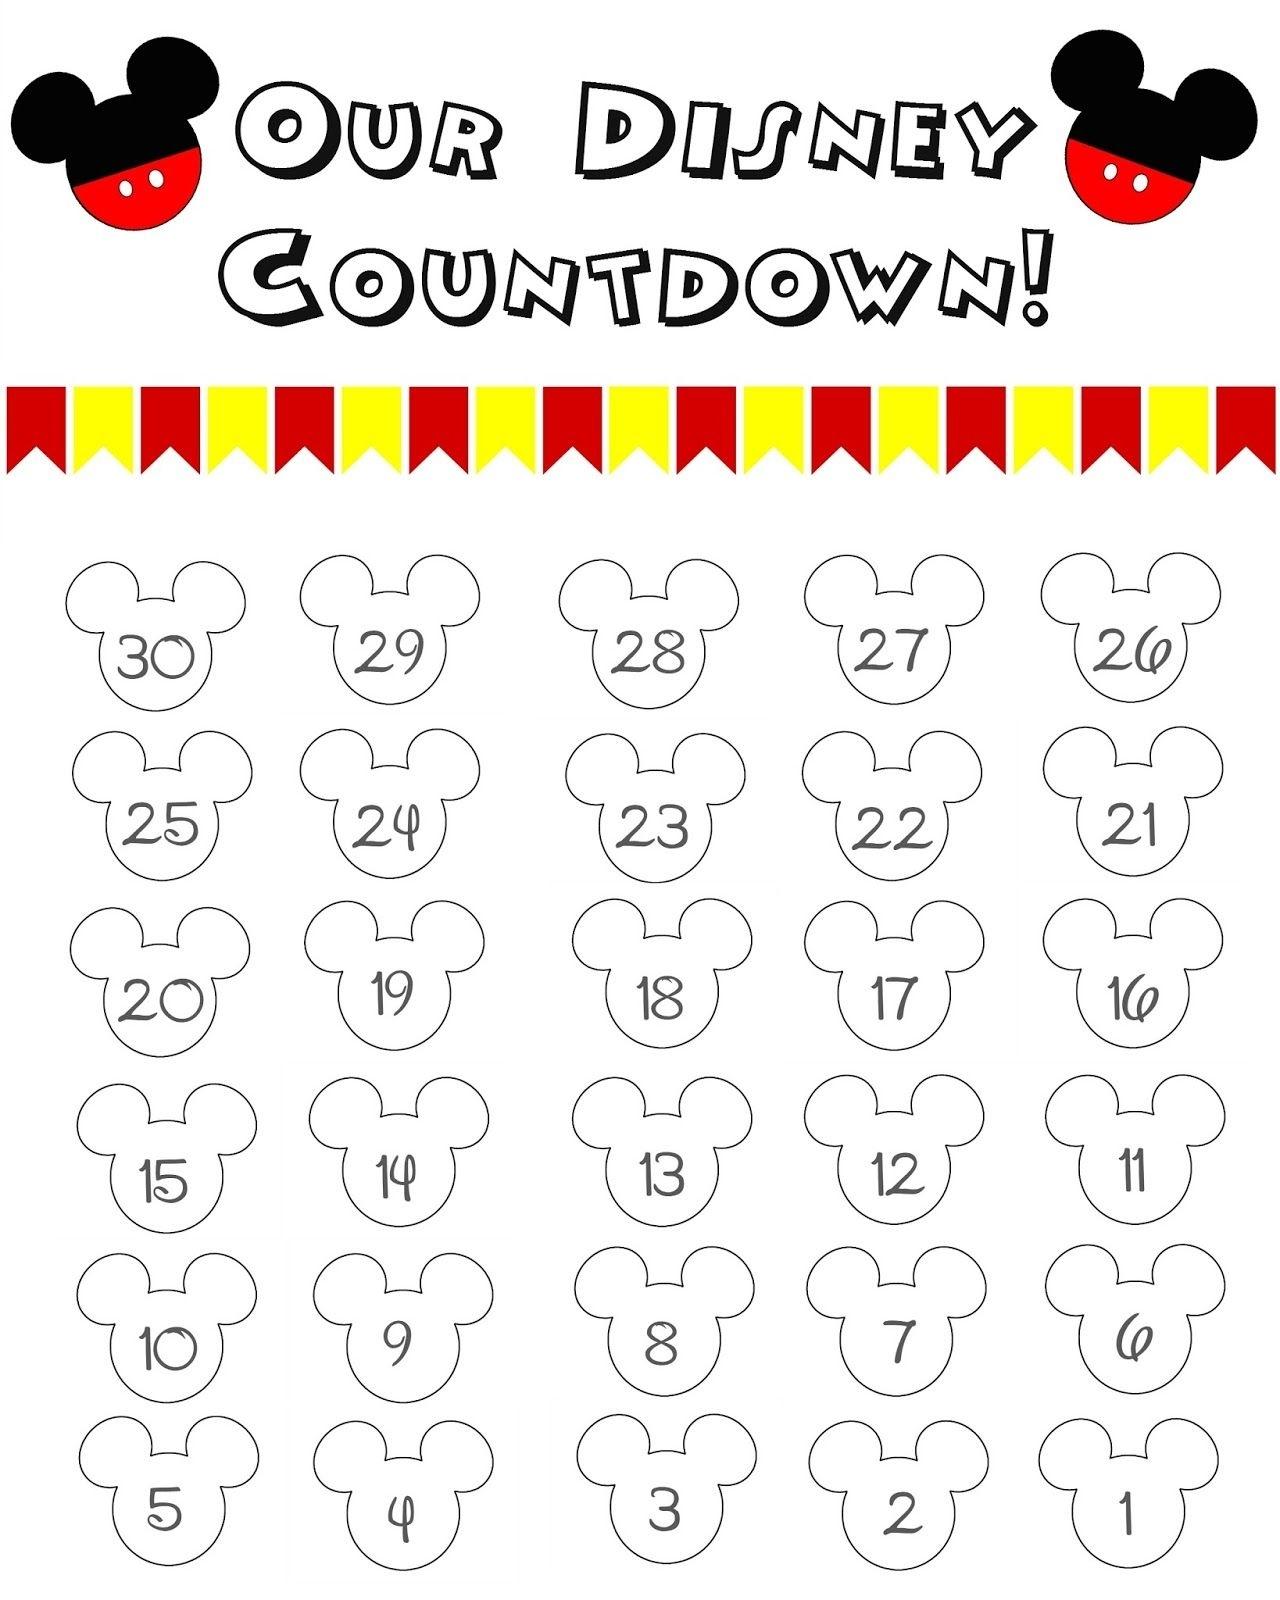 Disney World Countdown Calendar - Free Printable   Disney Dashing Printable Count Down To Disney